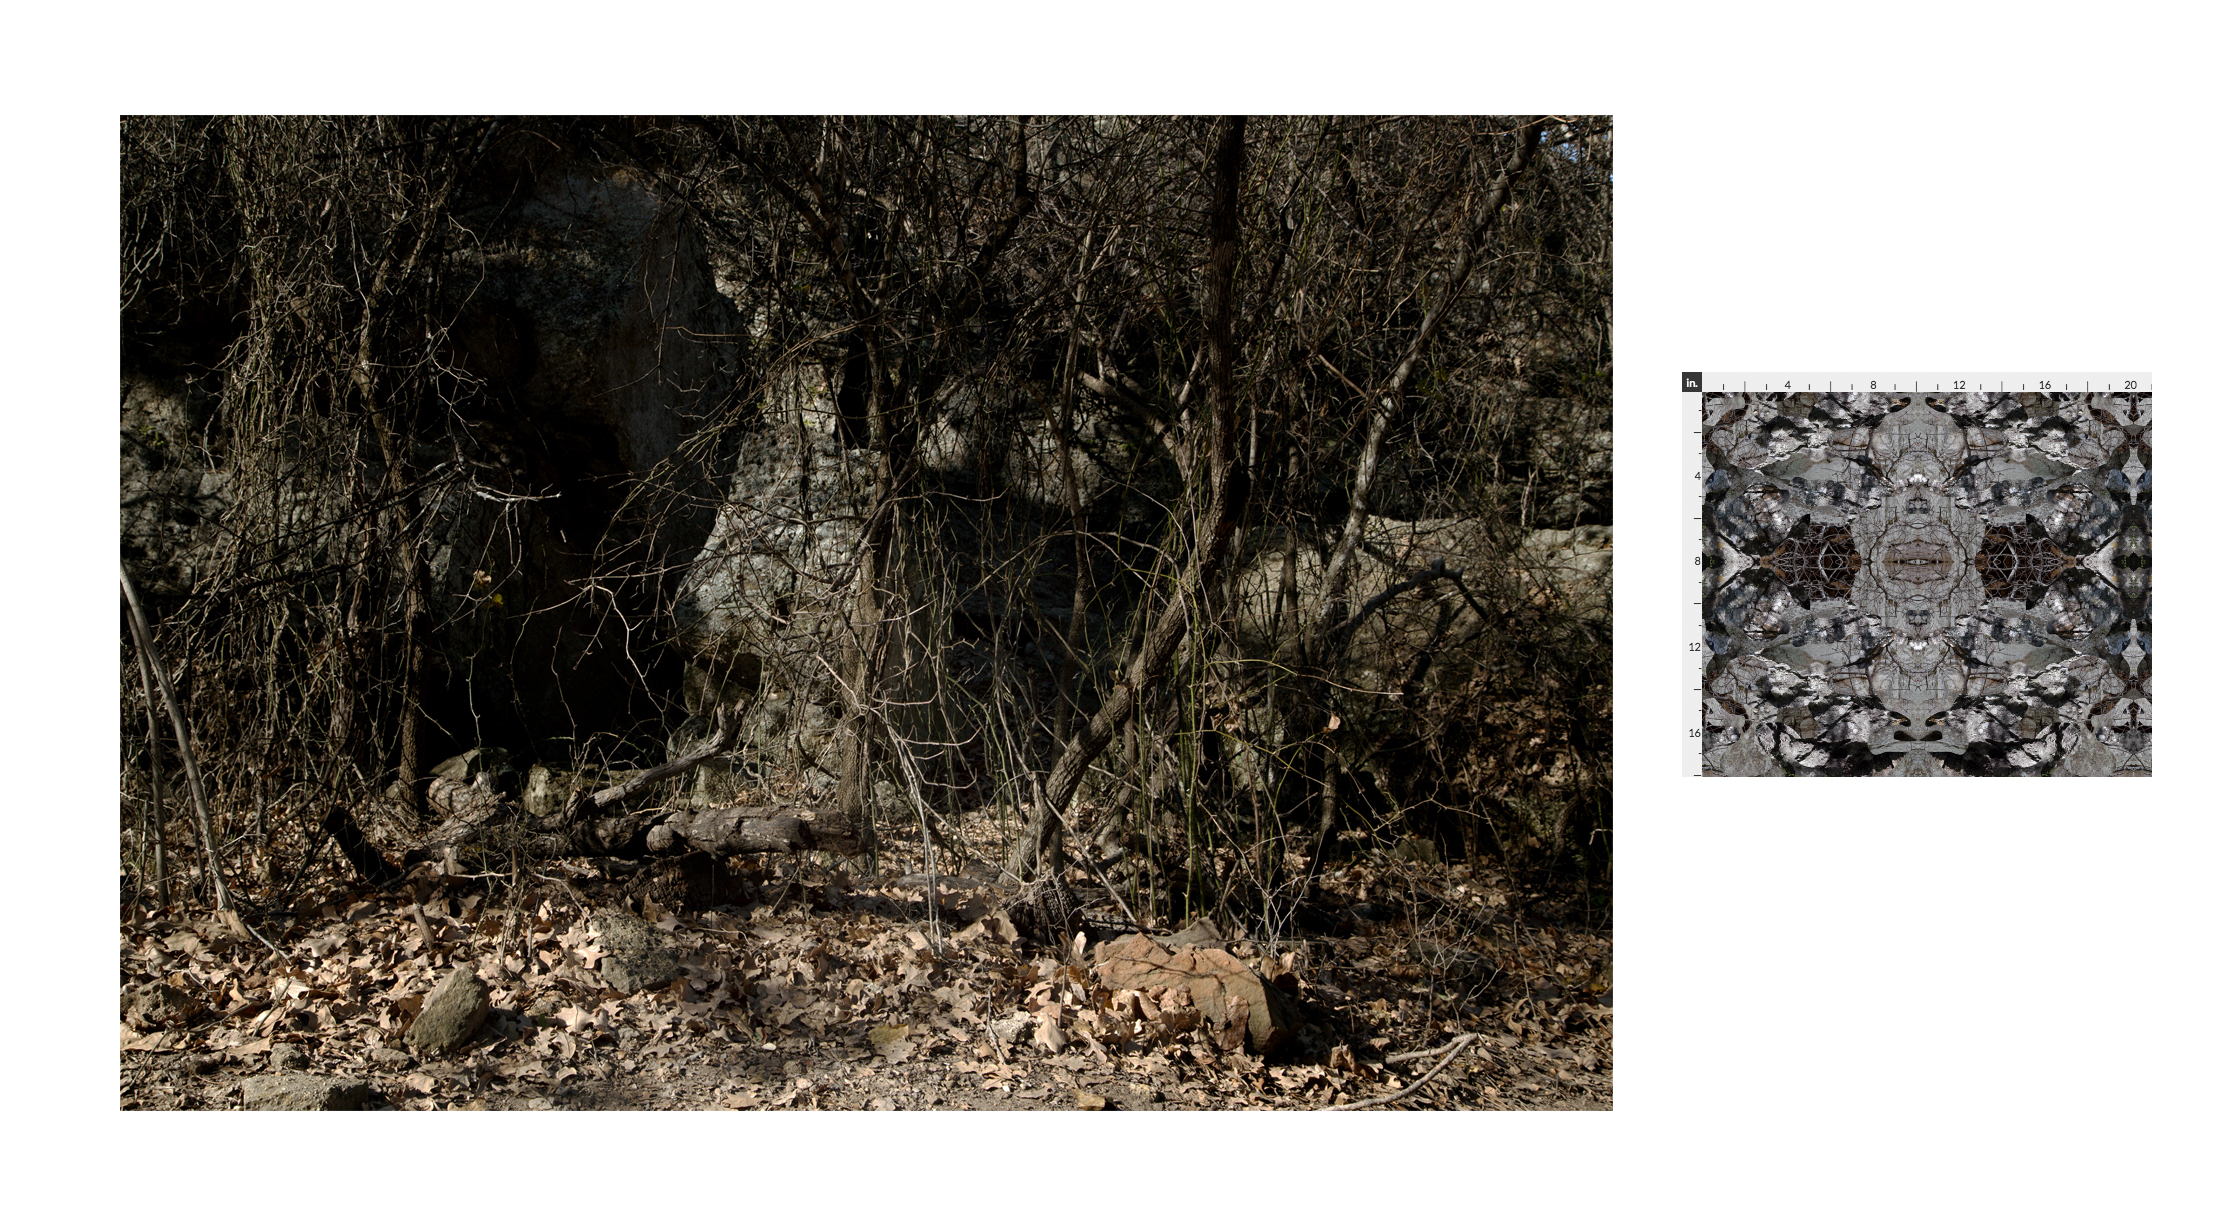 MINERAL WELLS PARK LANDSCAPE STUDY & TEXTILE DESIGN   2017  Left: Landscape study taken at Mineral Wells Park.  Right: Digital textile design for border-crosser invisibility suit prototype, based on collected textures at Mineral Wells Park.